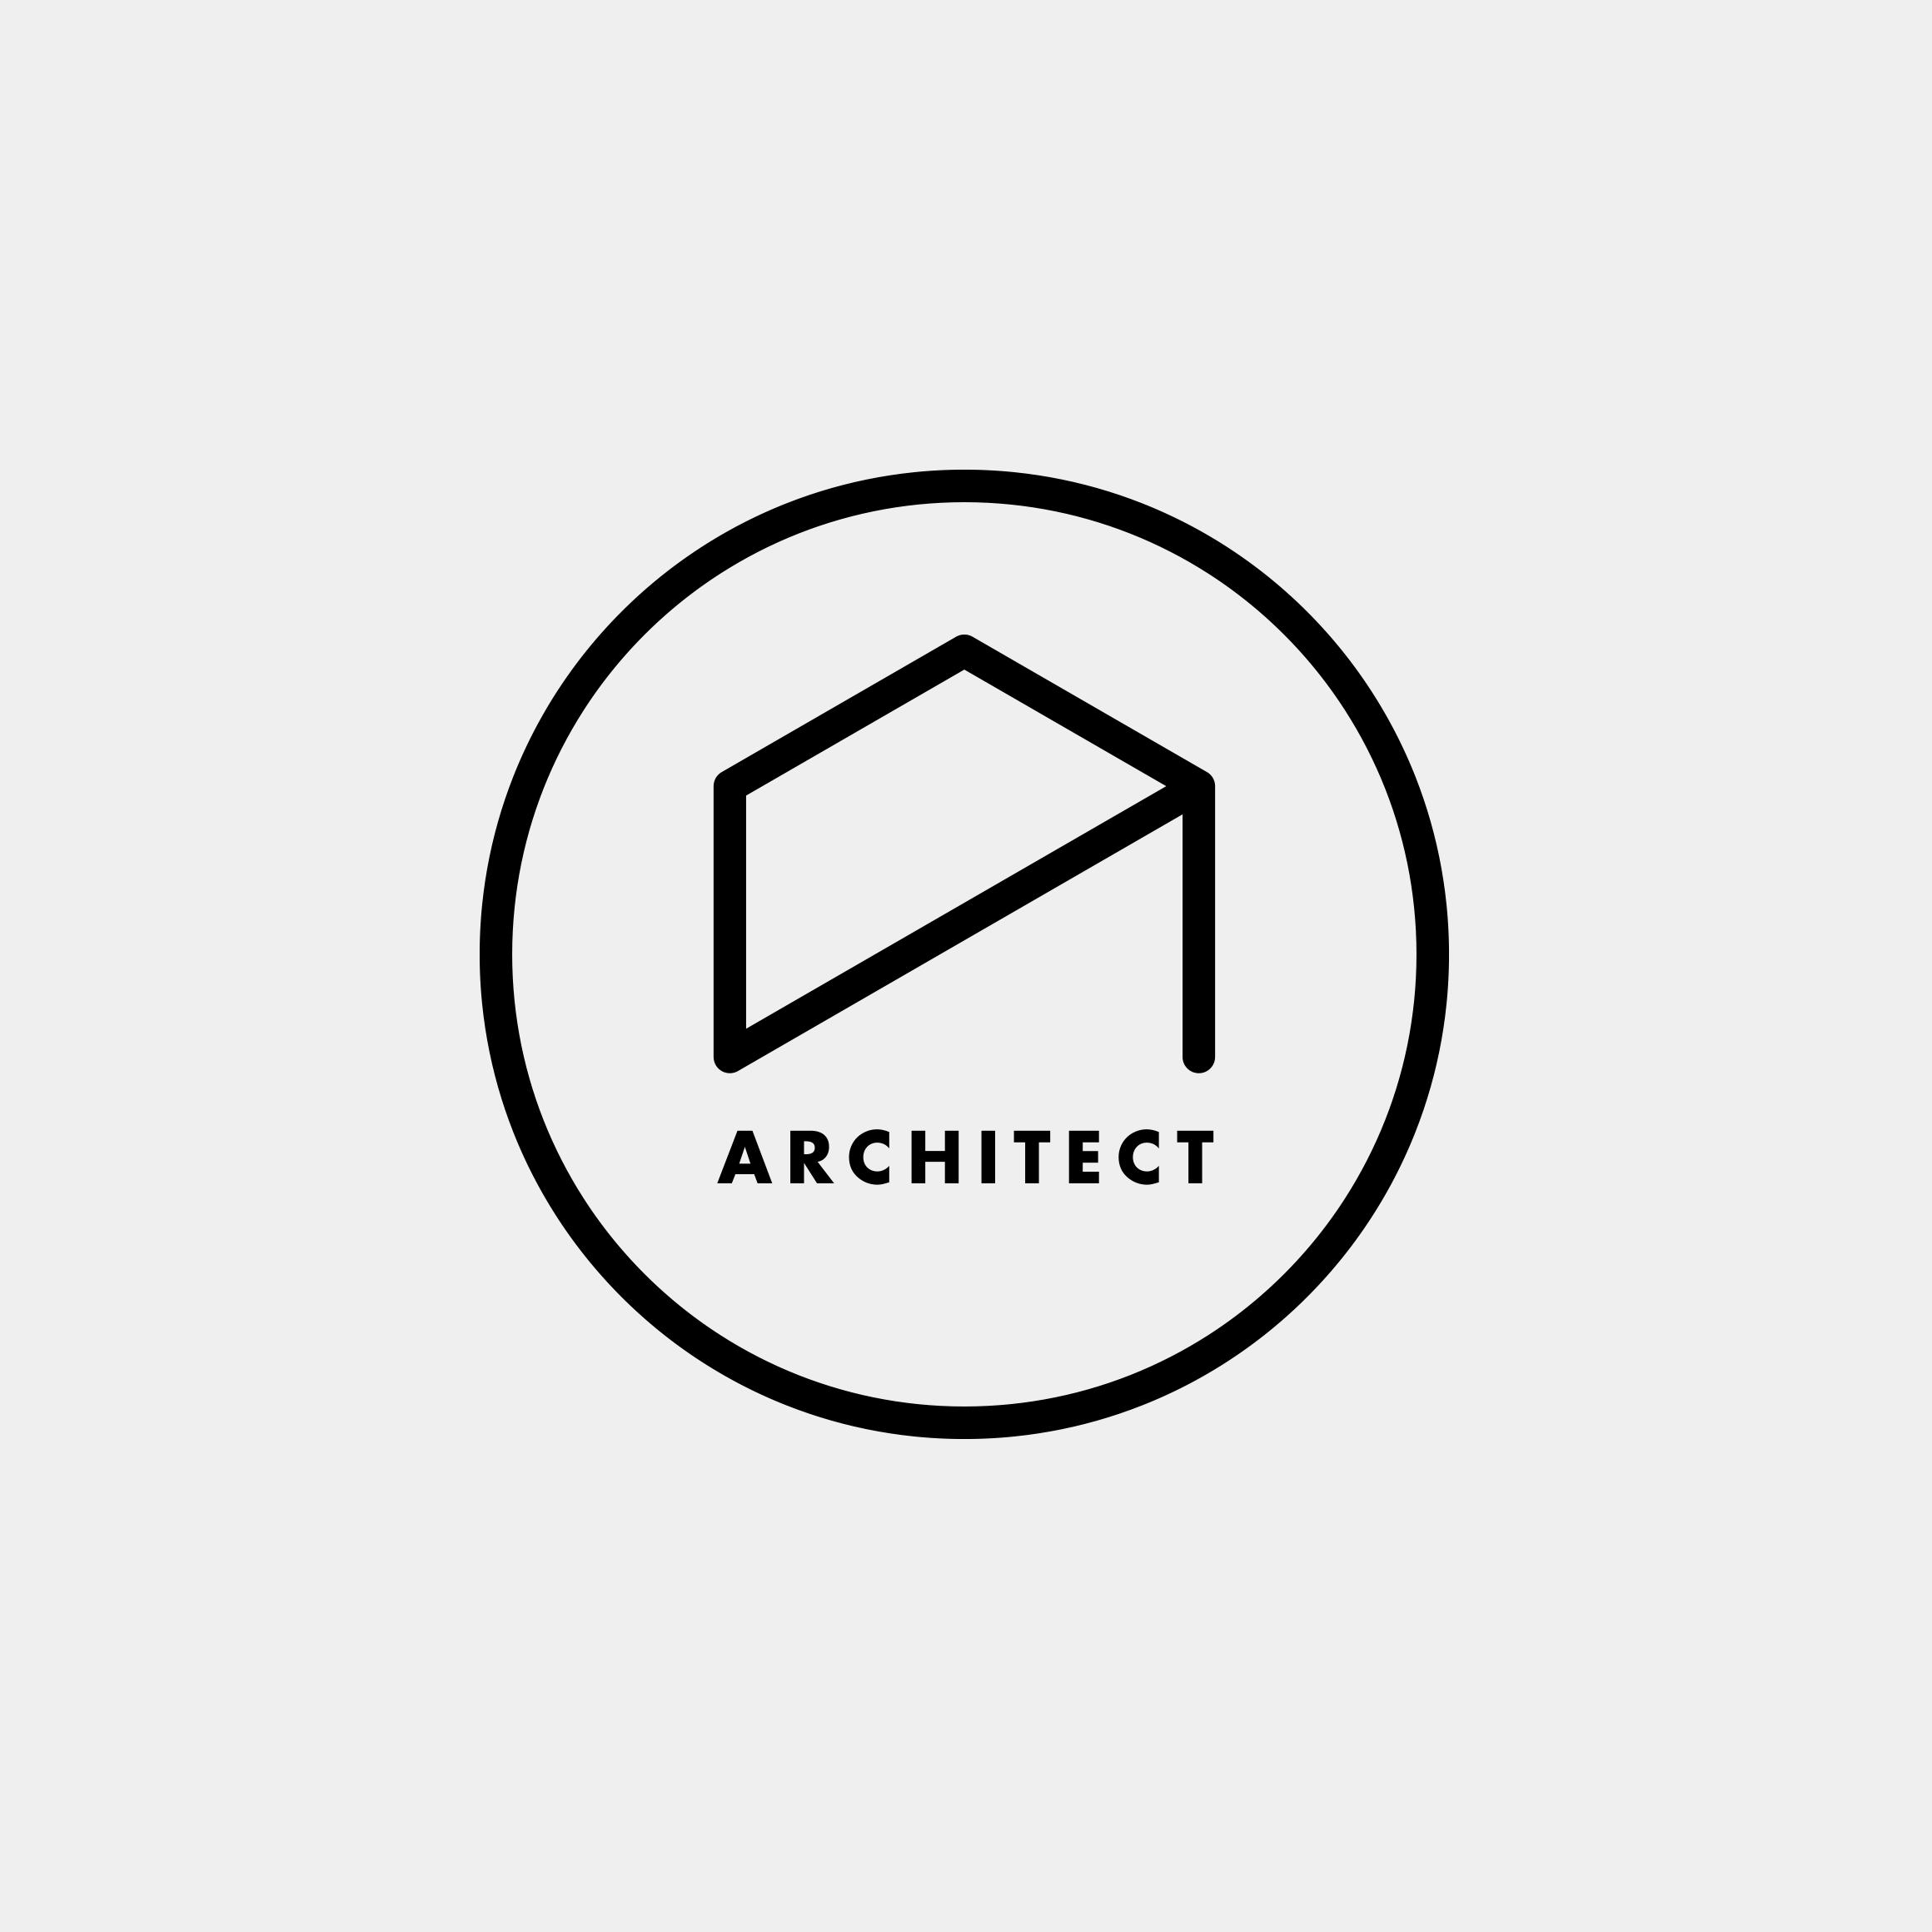 Michael lassiter product ux ui design for Architecture logo